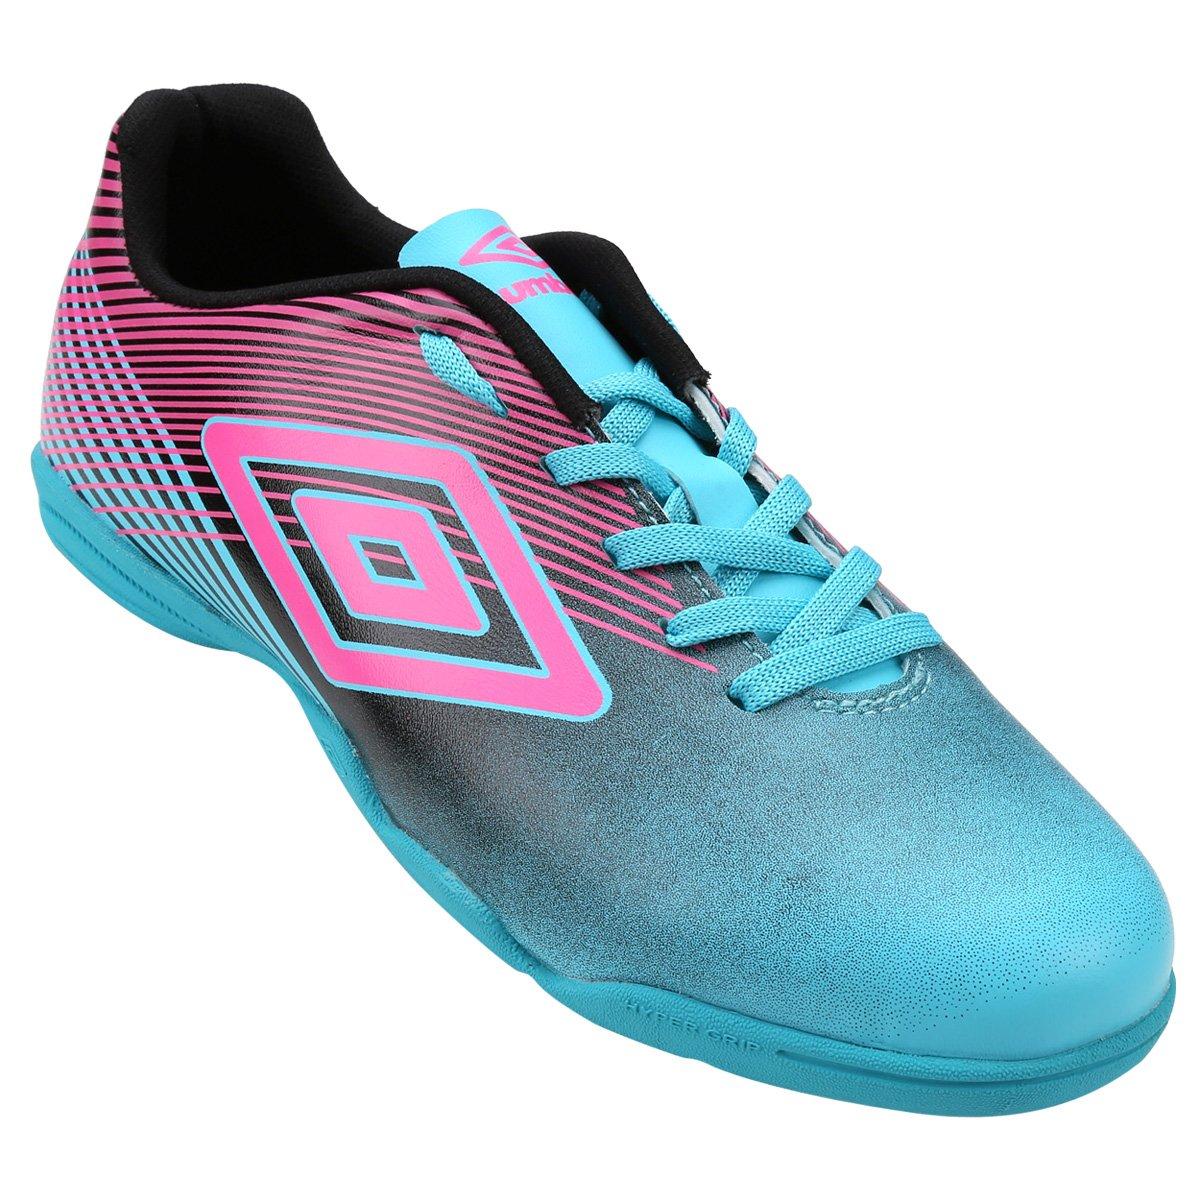 ce3b330608cd8 Chuteira Futsal Umbro Slice 3 Masculina - Compre Agora